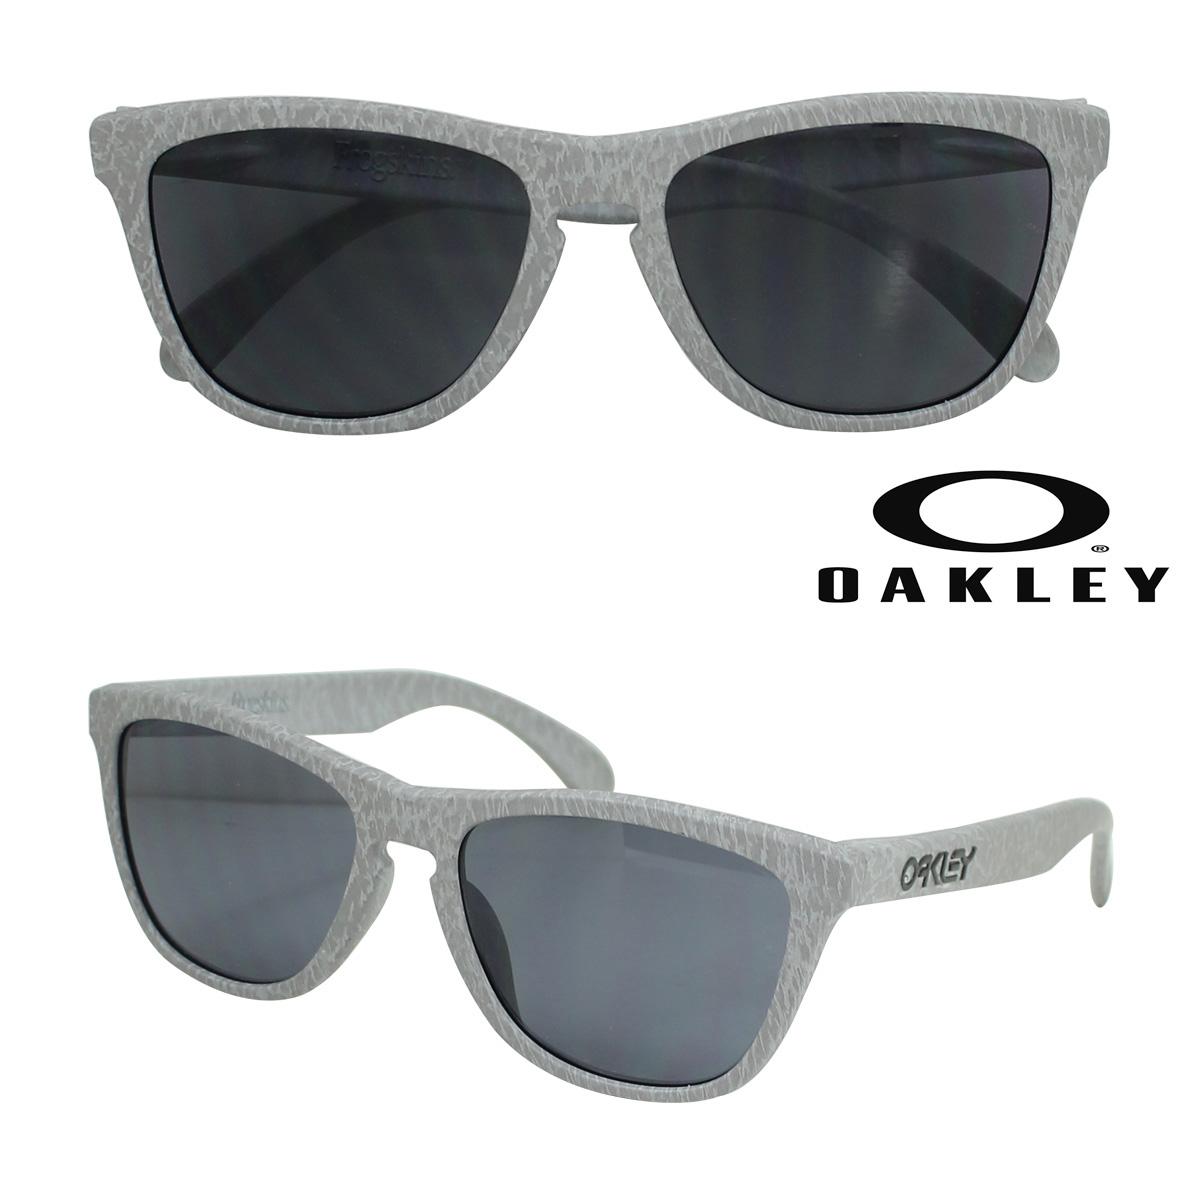 f754072fafaf ... frogskins frog skin mens womens glasses 24 298 matte black violet  unisex regular rakuten global market e5bf3 b0c71  coupon code for oakley  oakley ...